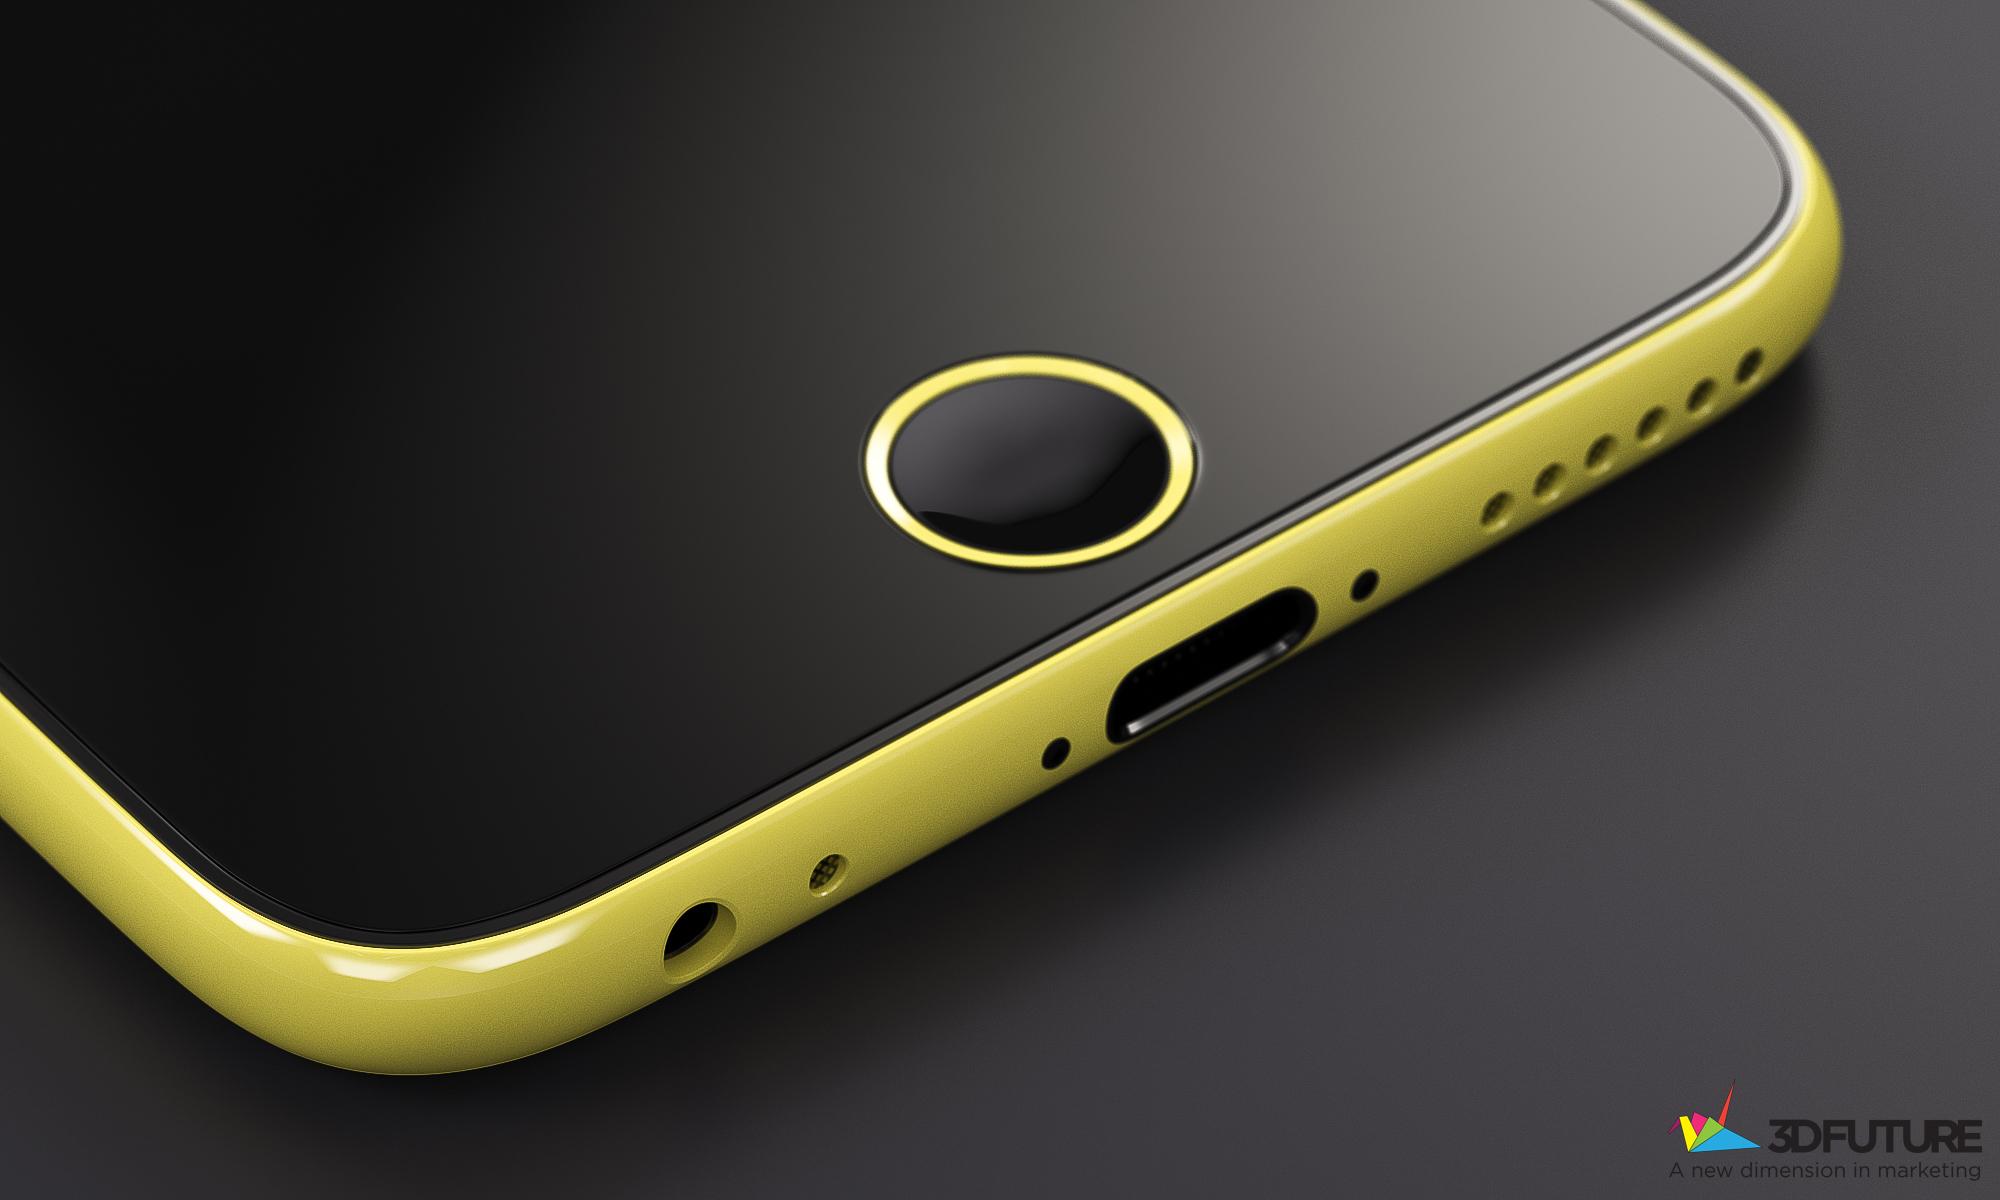 velikolepnyiy-iphone-6c-plastikovyiy-analog-iphone-6-kontsept--